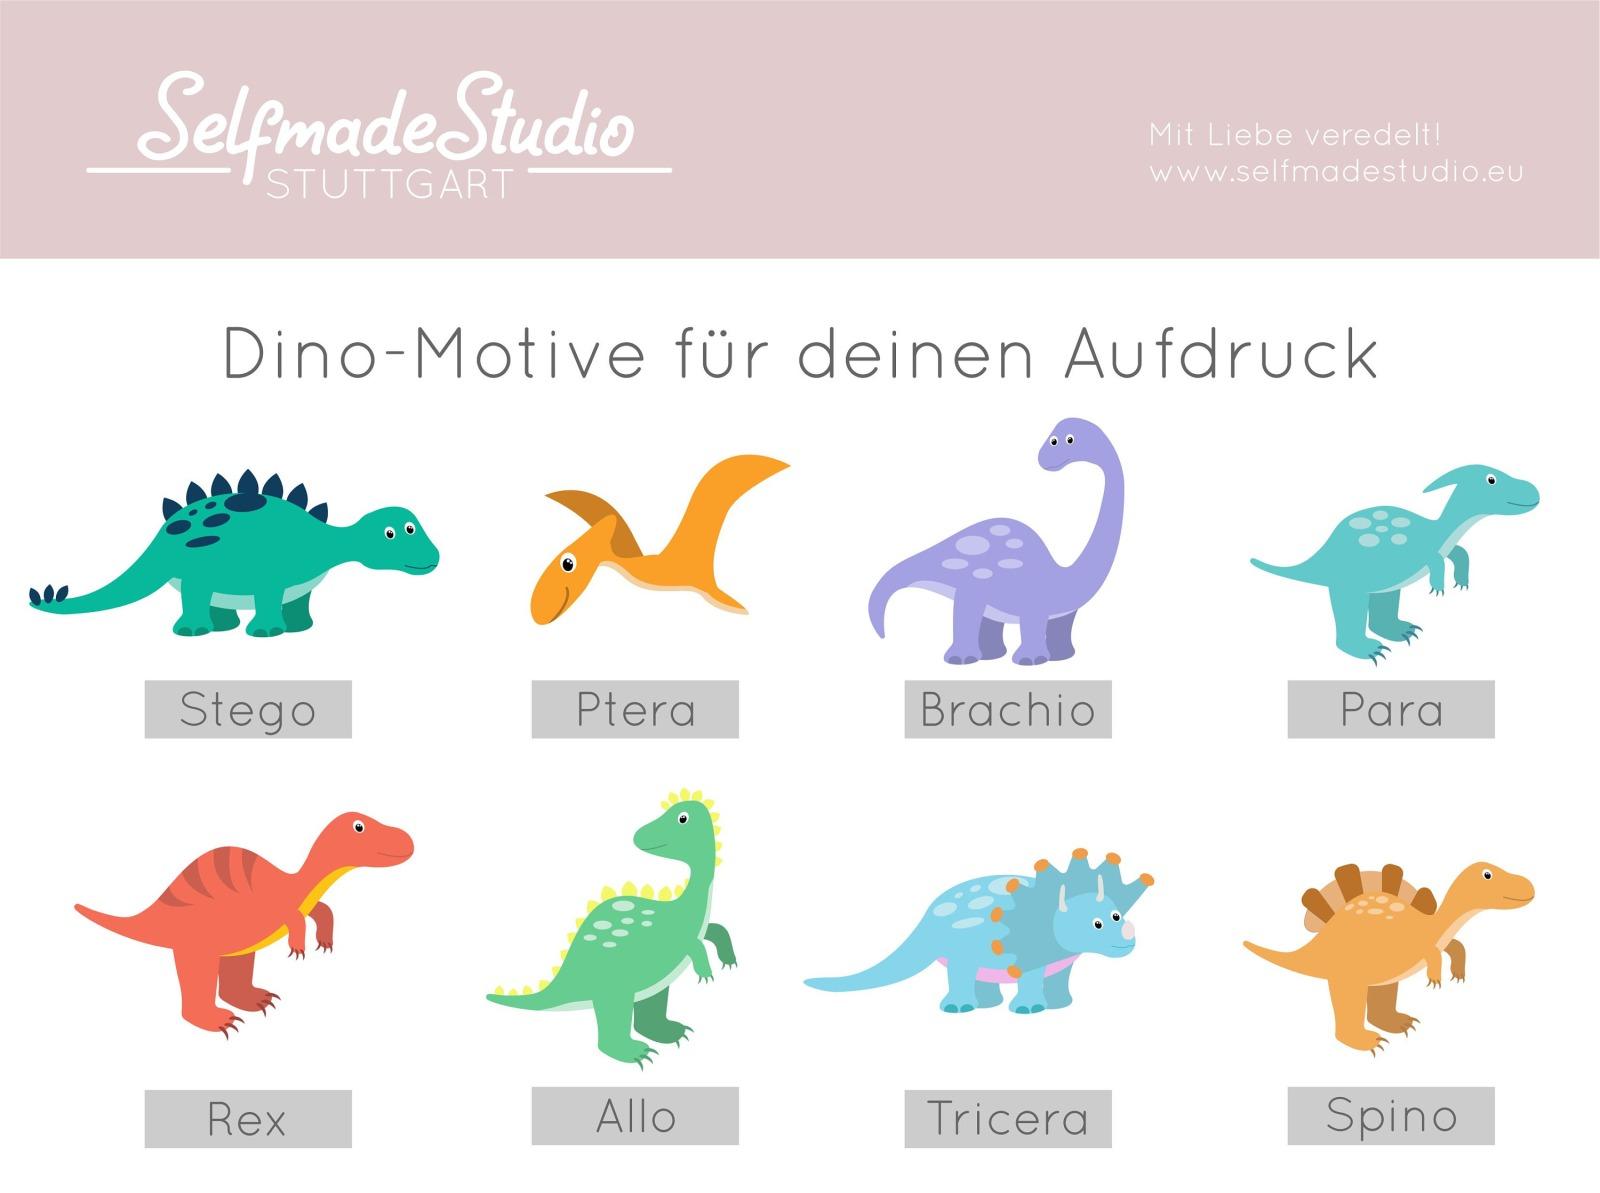 Tasse Dinosaurier-Look personalisiert mit Wunschname 7